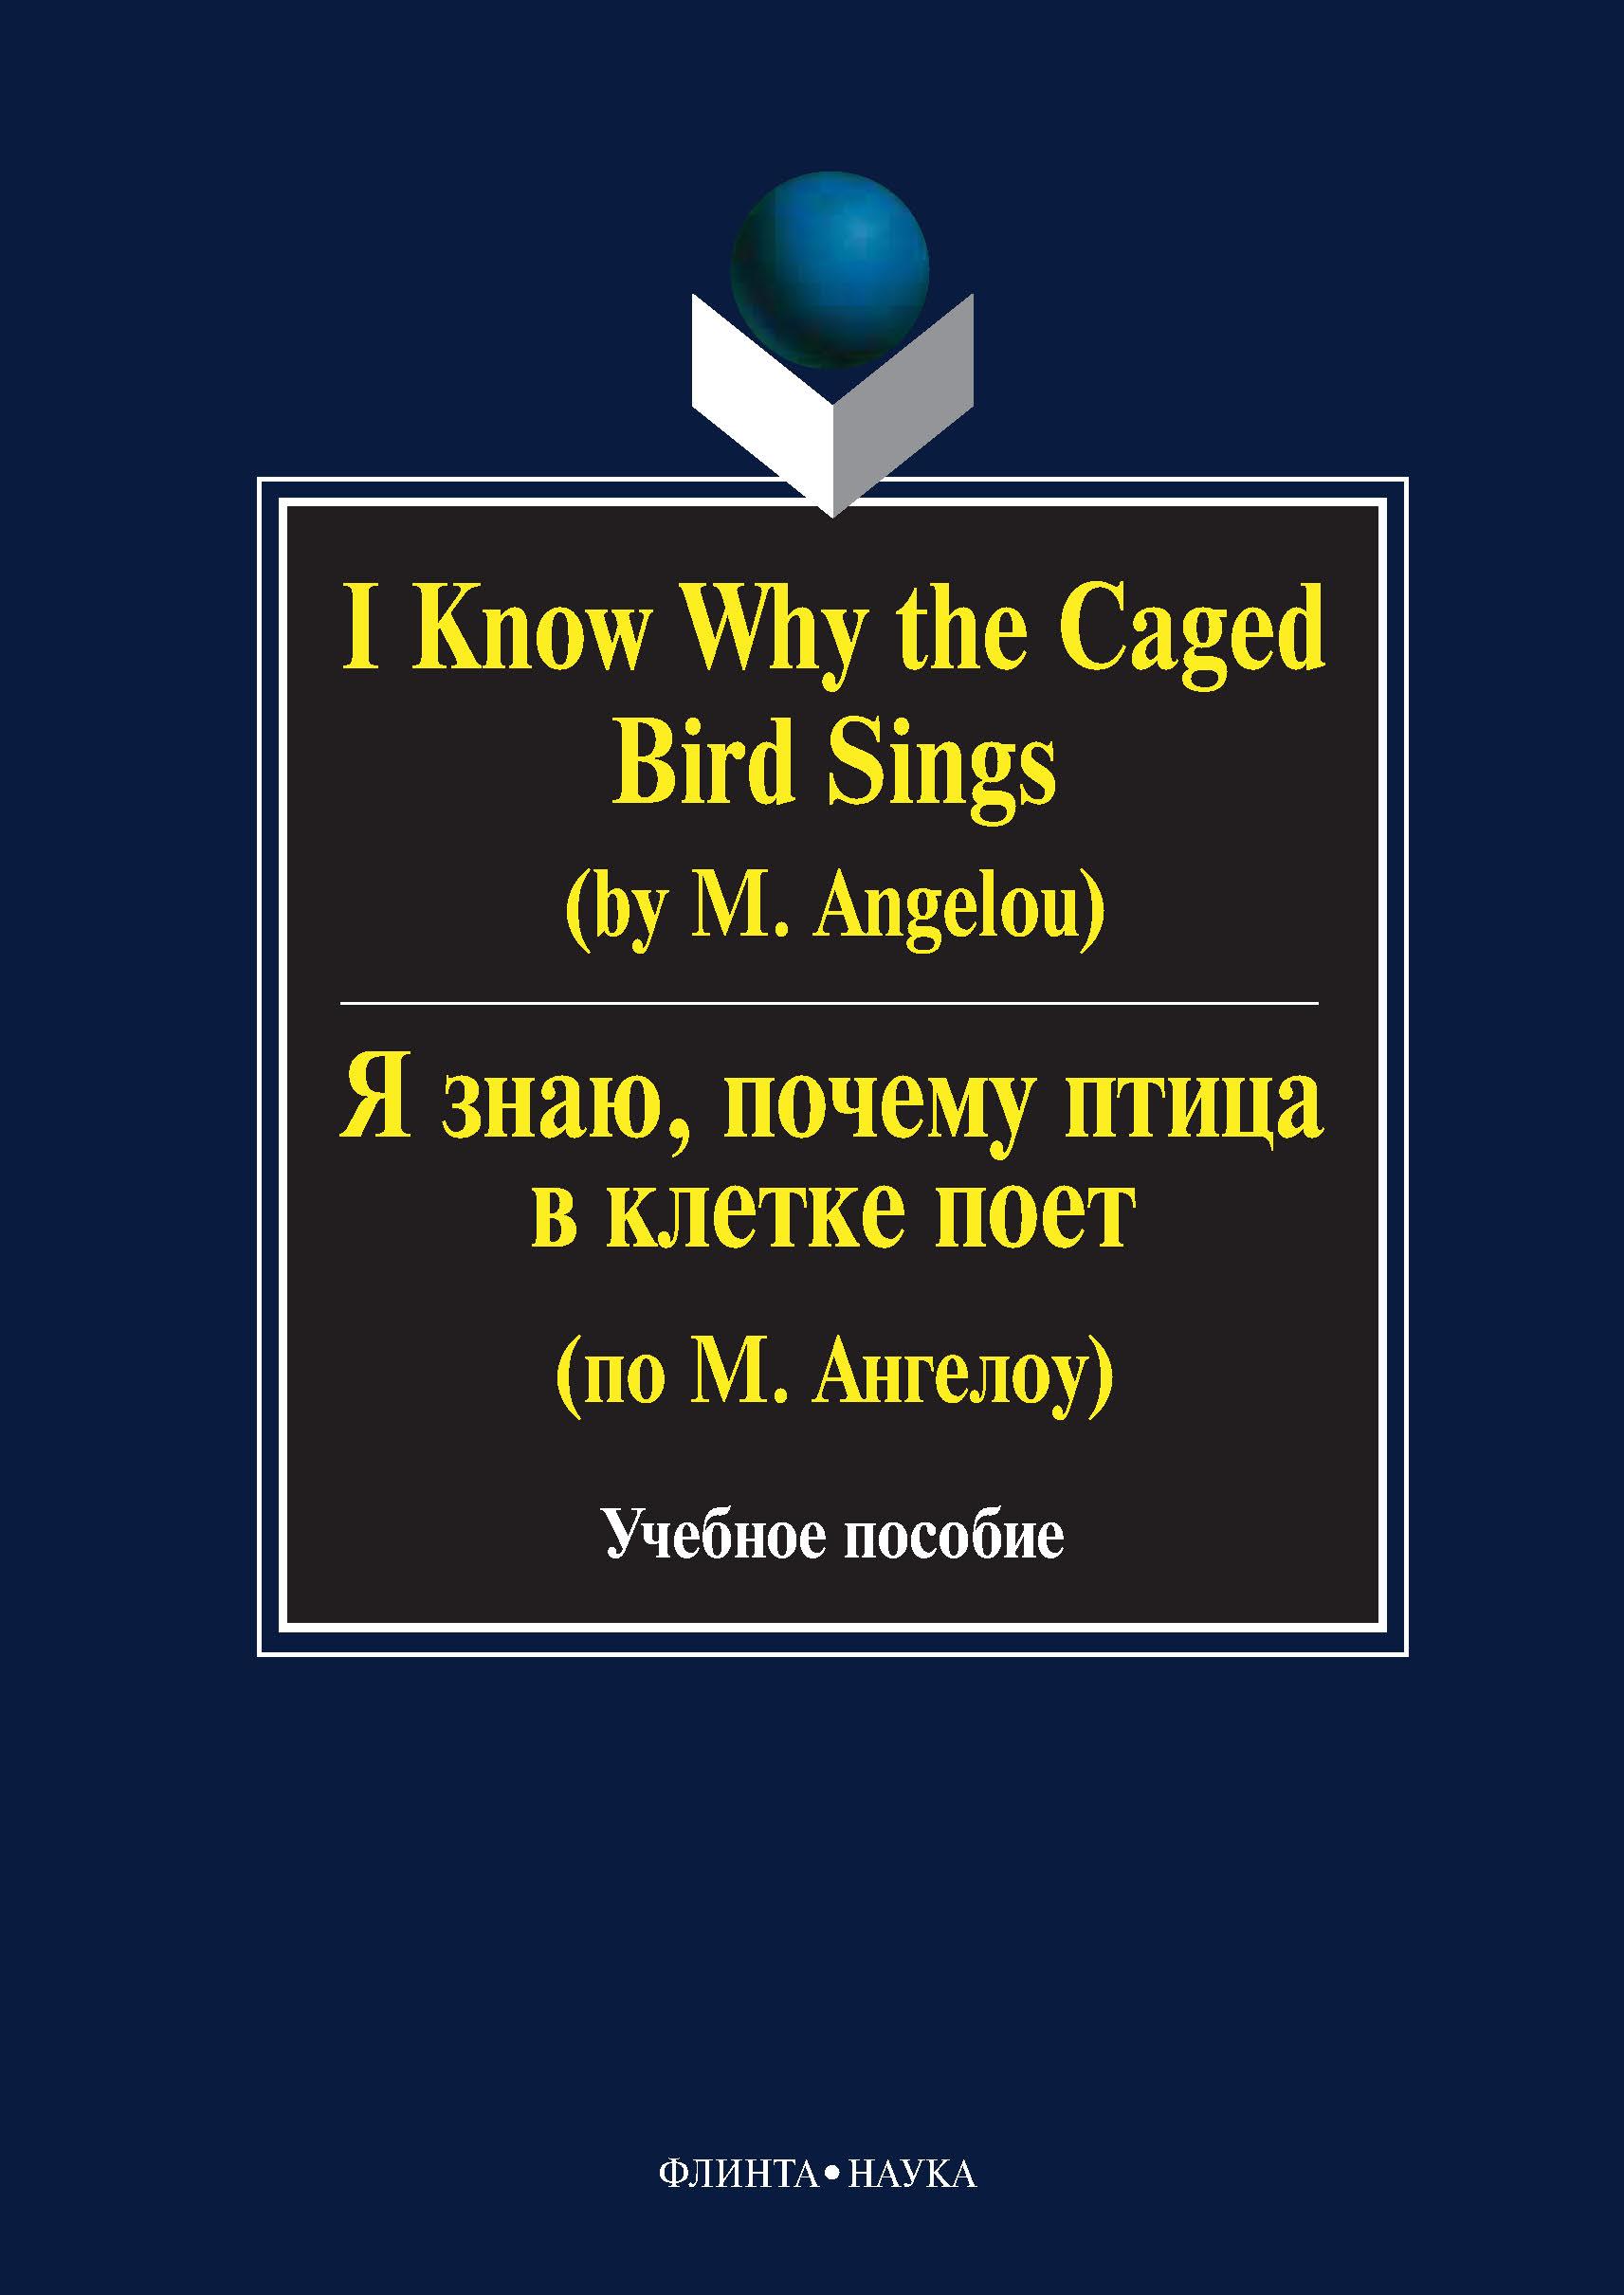 Фото - Г. Н. Бабич I Know Why the Caged Bird Sings (by M. Angelou) / Я знаю, почему птица в клетке поет (по М. Ангелоу). Учебное пособие peep toe caged cut out gladiator sandals